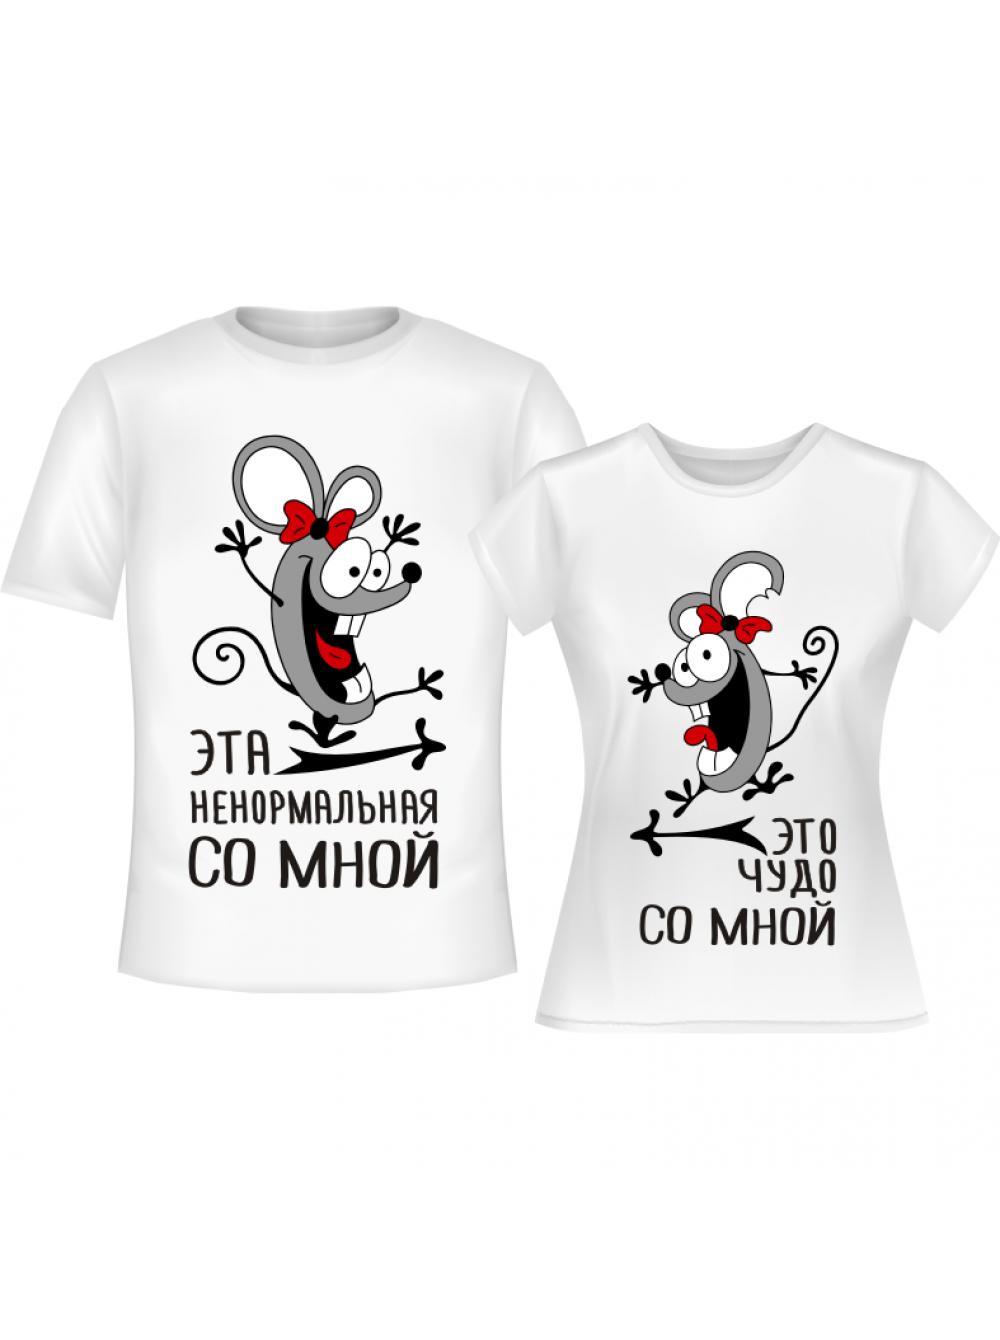 Рисунок на футболки для молодоженов